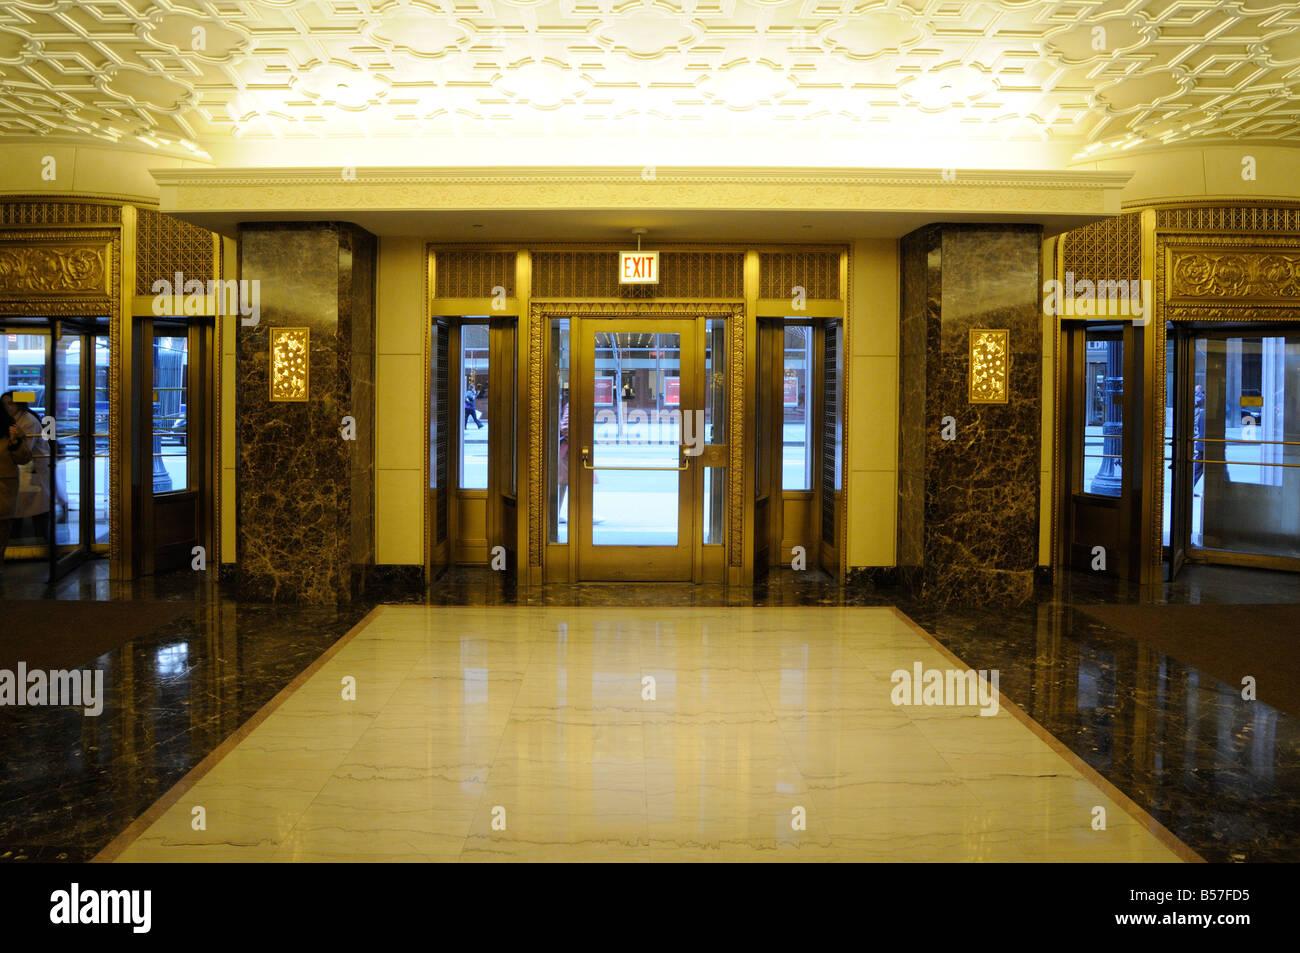 Art Deco Hoekbank.Entrance To The Art Deco Style Lobby Of Lasalle Bank